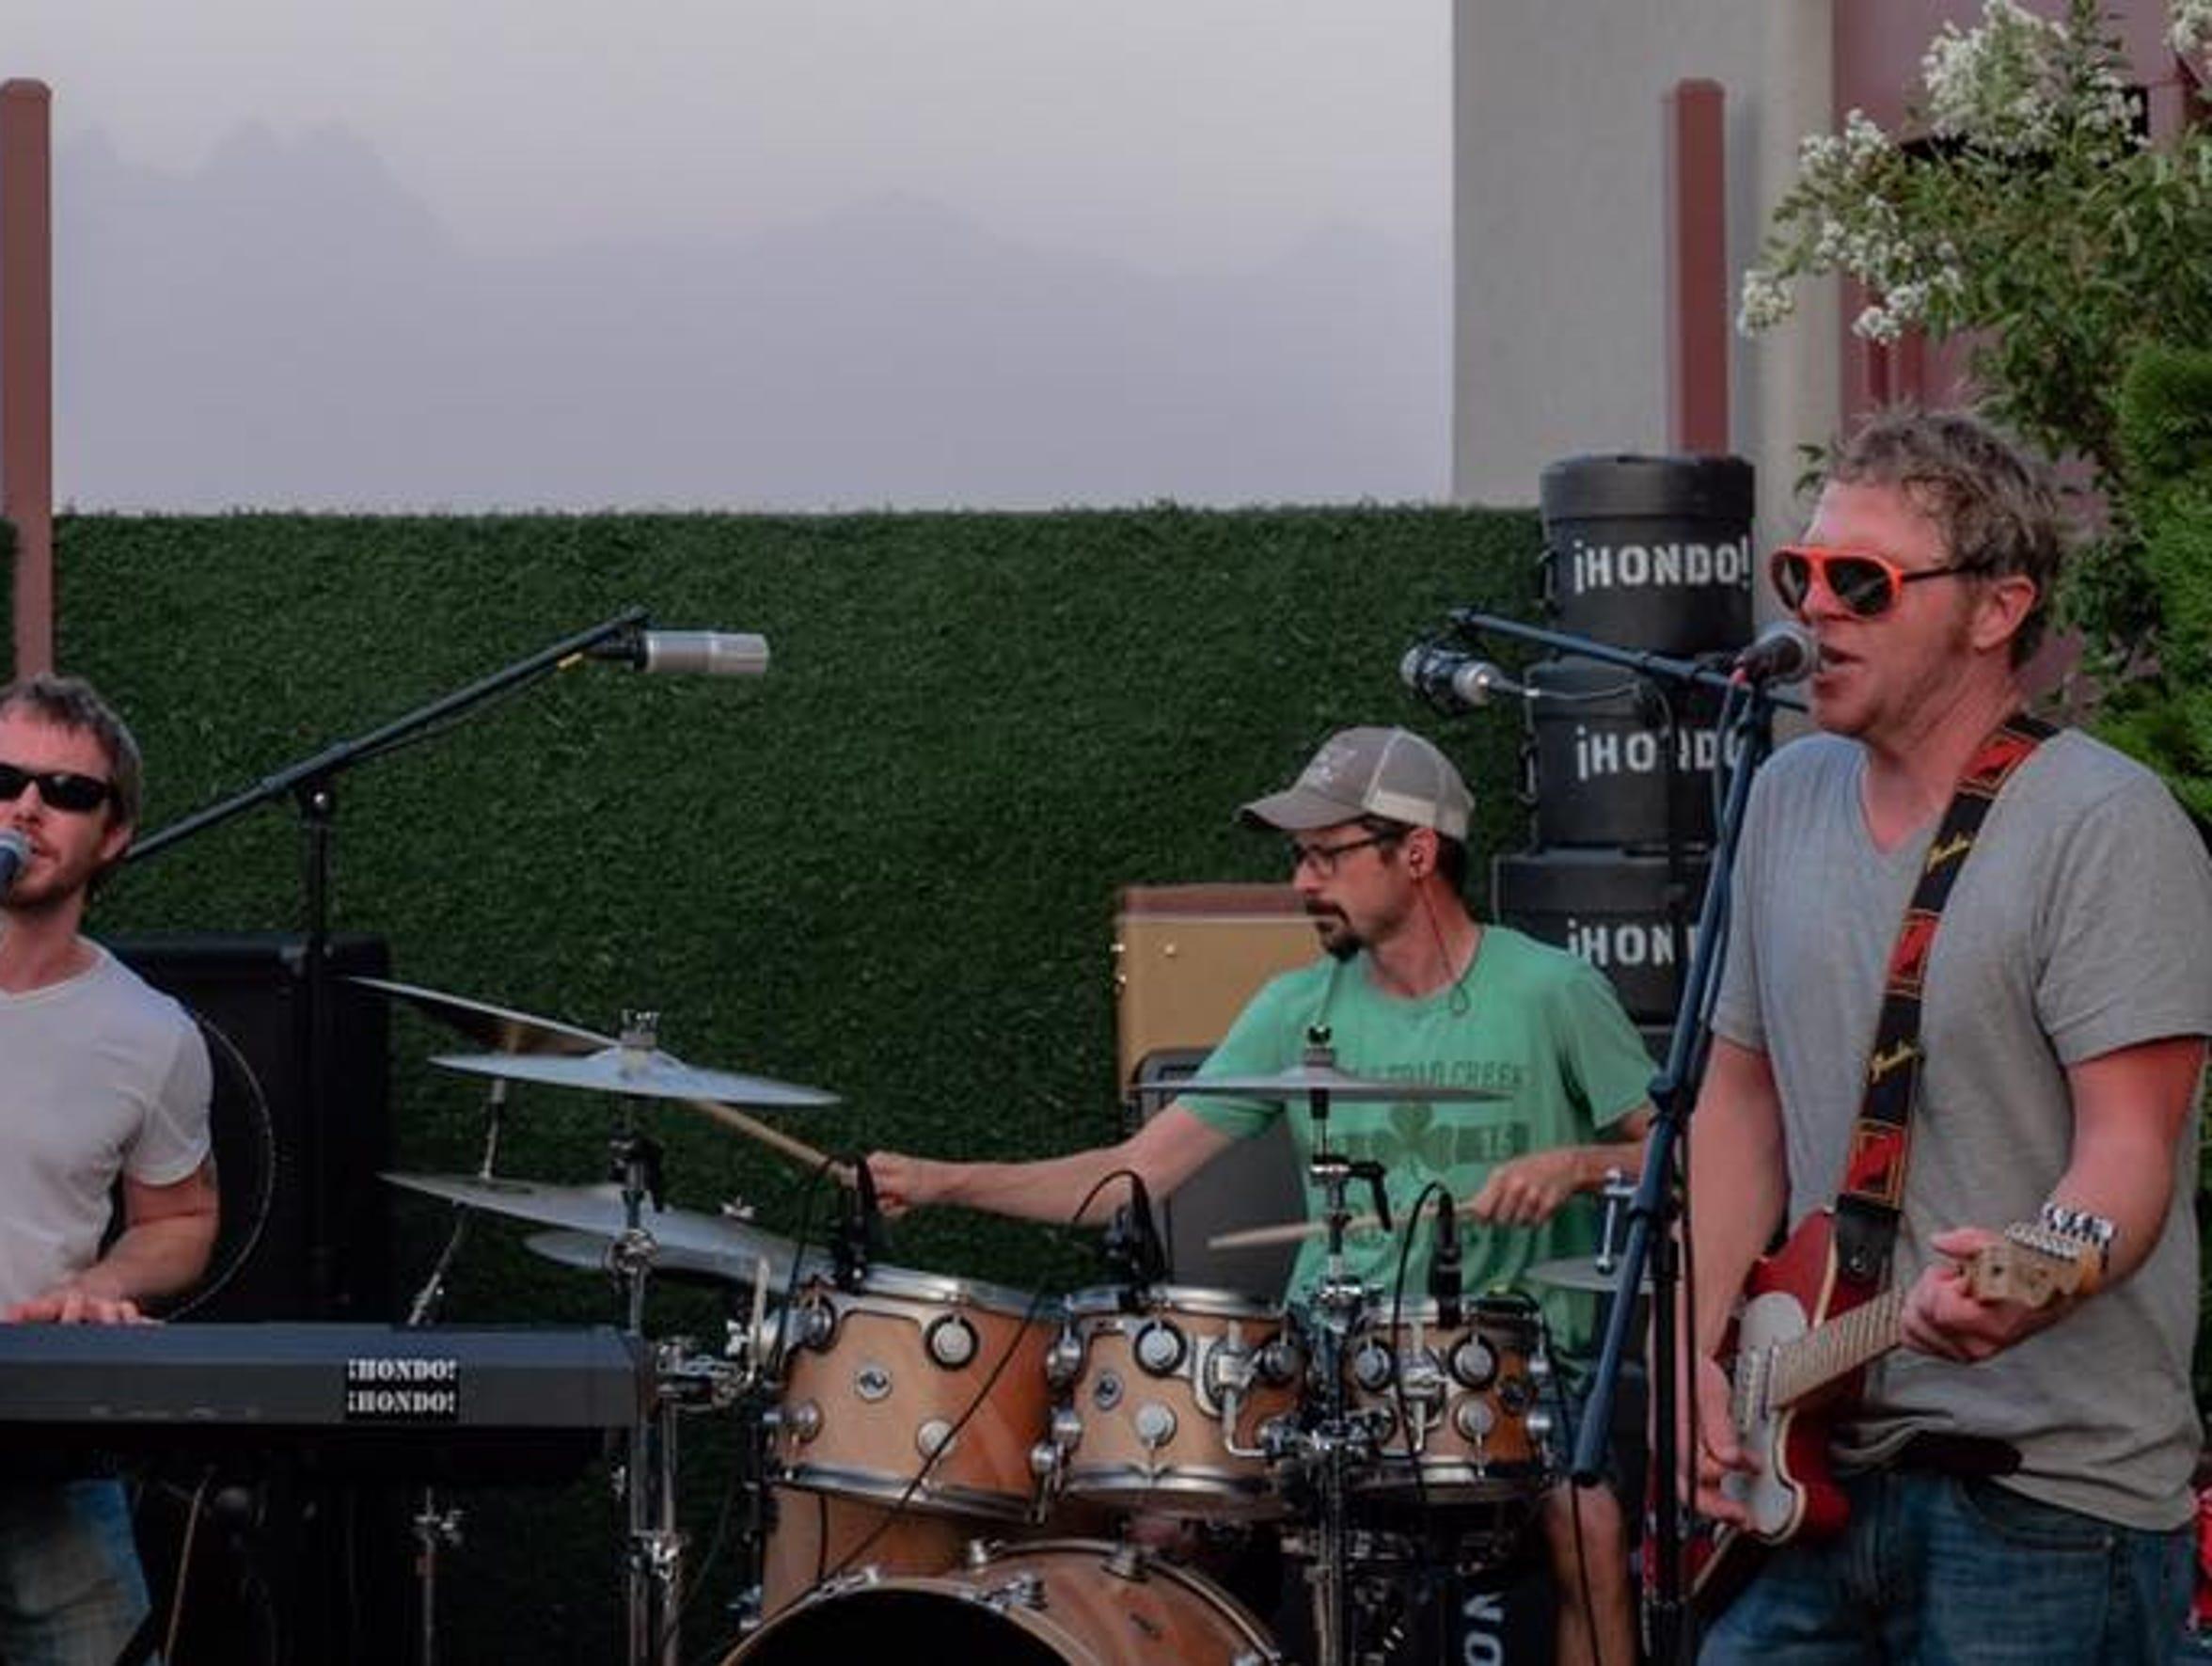 Local rock band ¡HONDO! ¡HONDO! consists ofNeal Adelman (guitar, vocals),Alex Hallwyler (keyboard, vocals),Russell Larcher (bass) and Matt Swanson (drums).